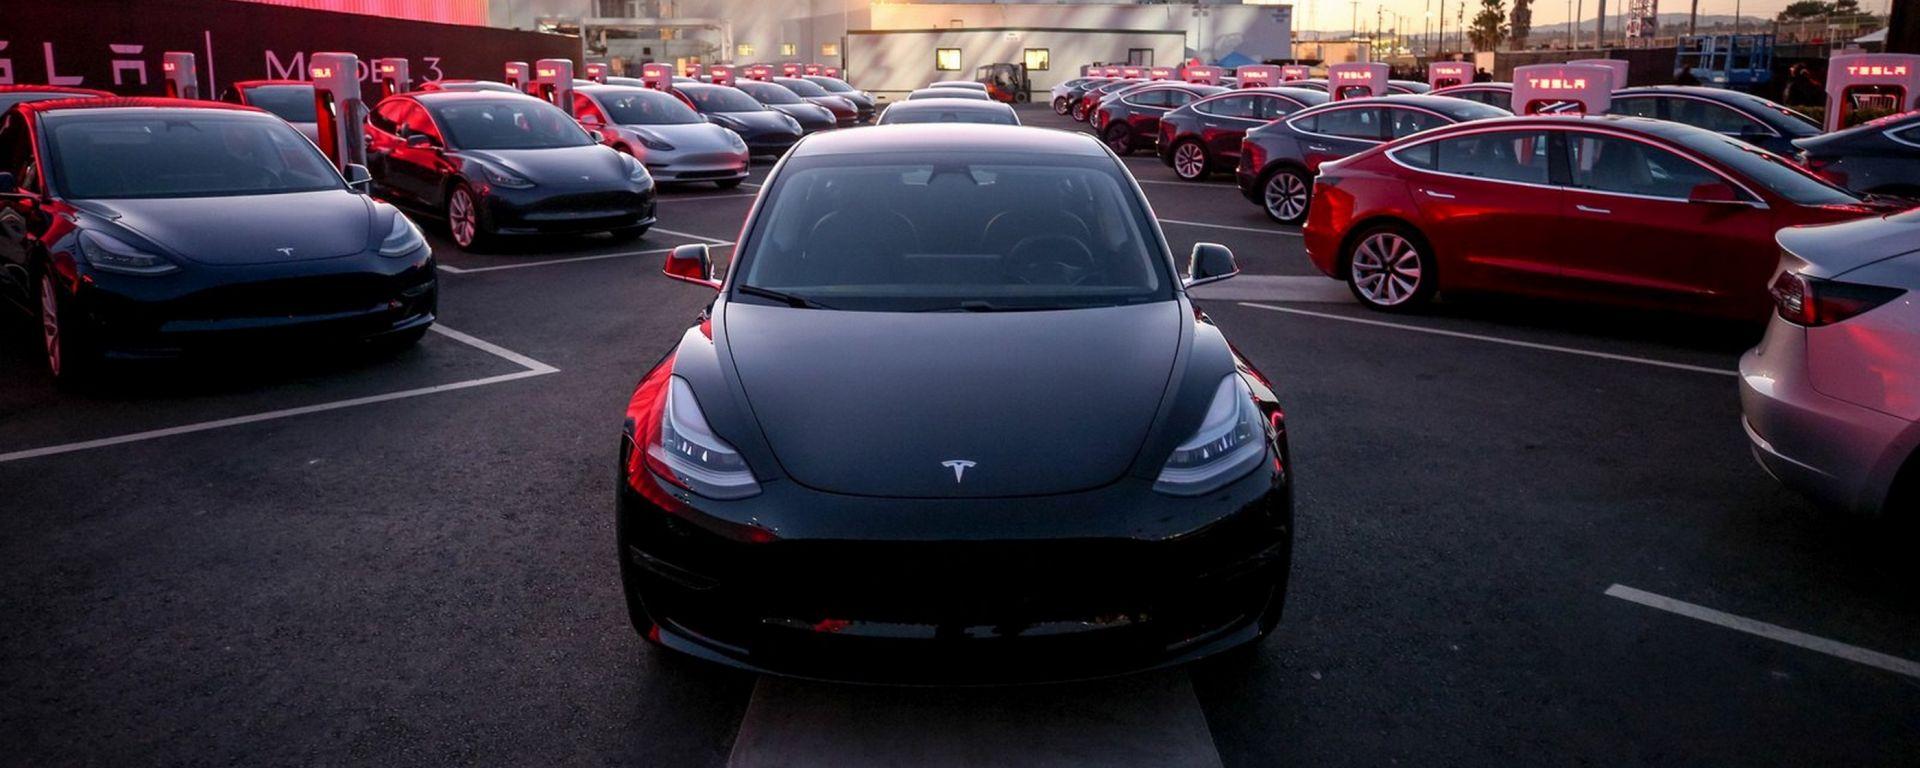 Tesla avrà un'intelligenza artificiale ispirata a Supercar